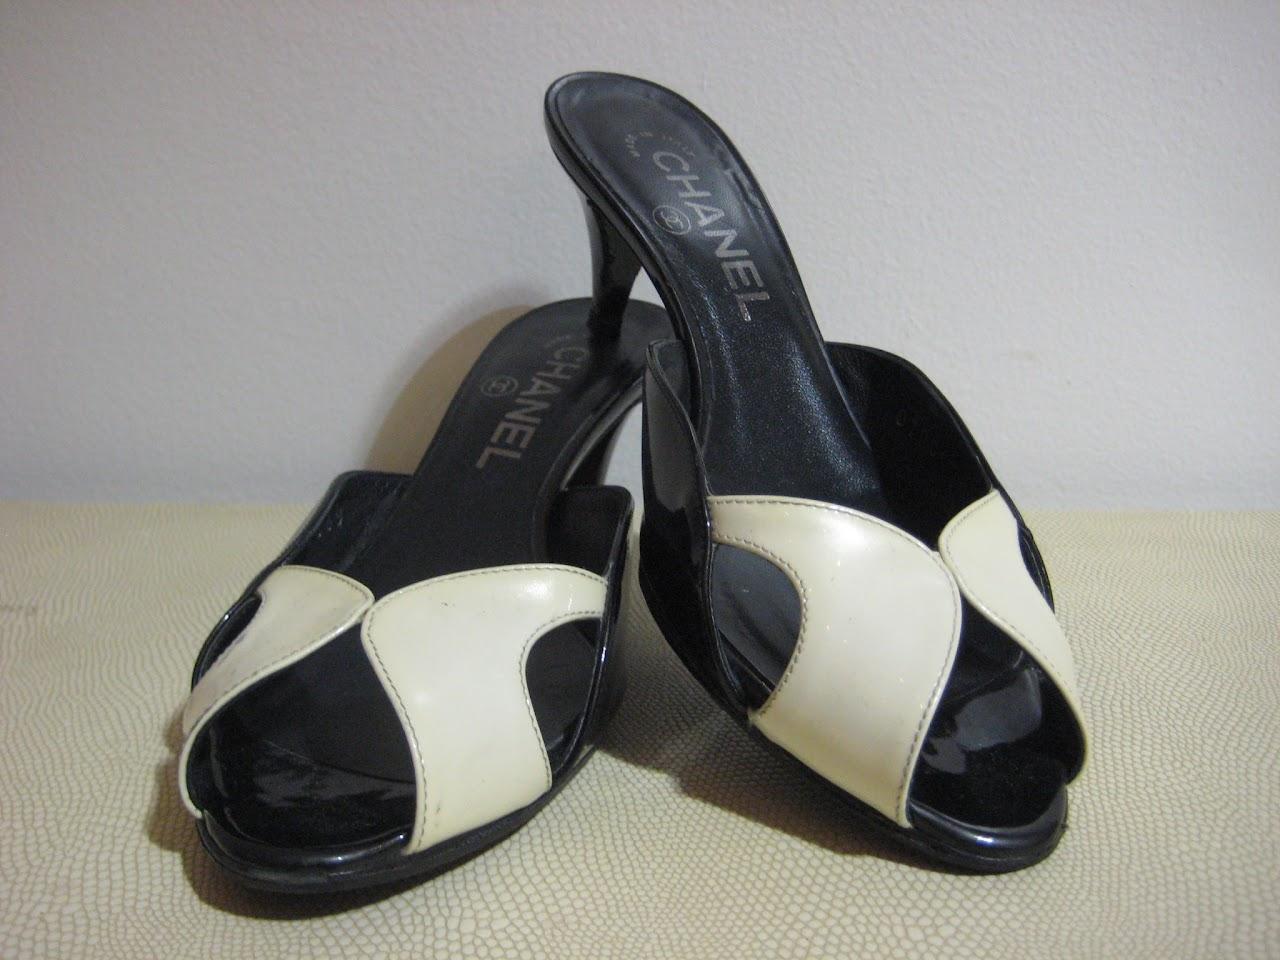 Chanel Peep-Toe Mules